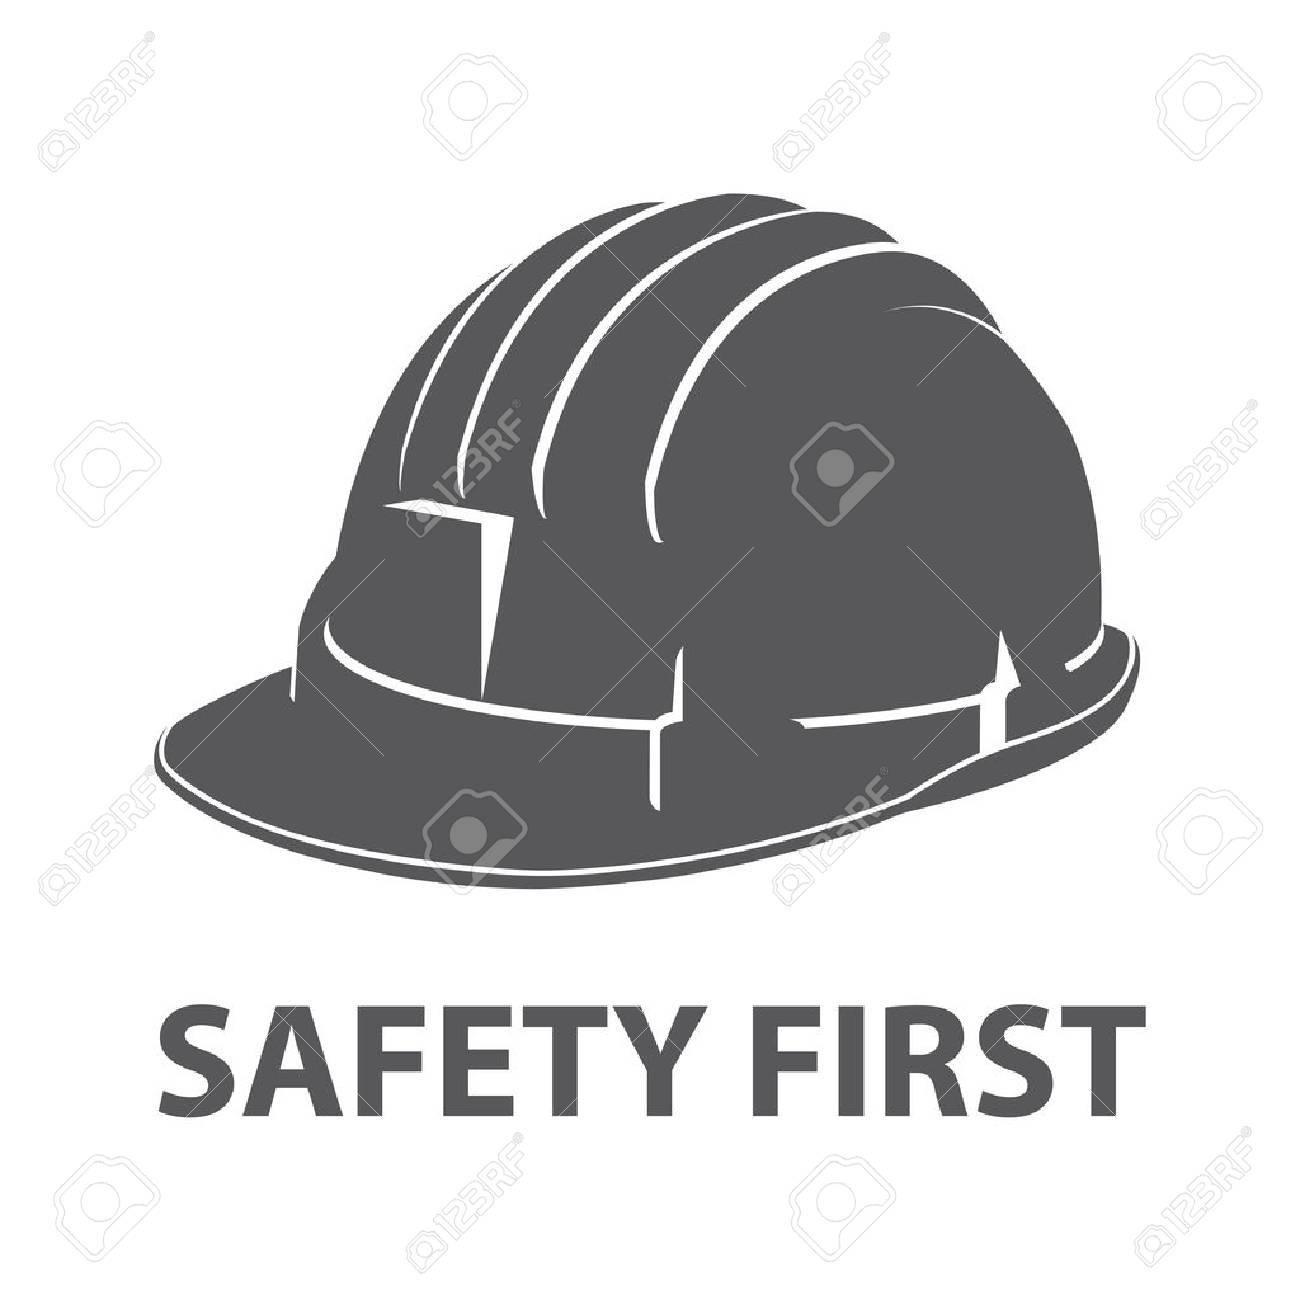 Safety hard hat icon symbol isolated on white background. Vector illustration - 50510616